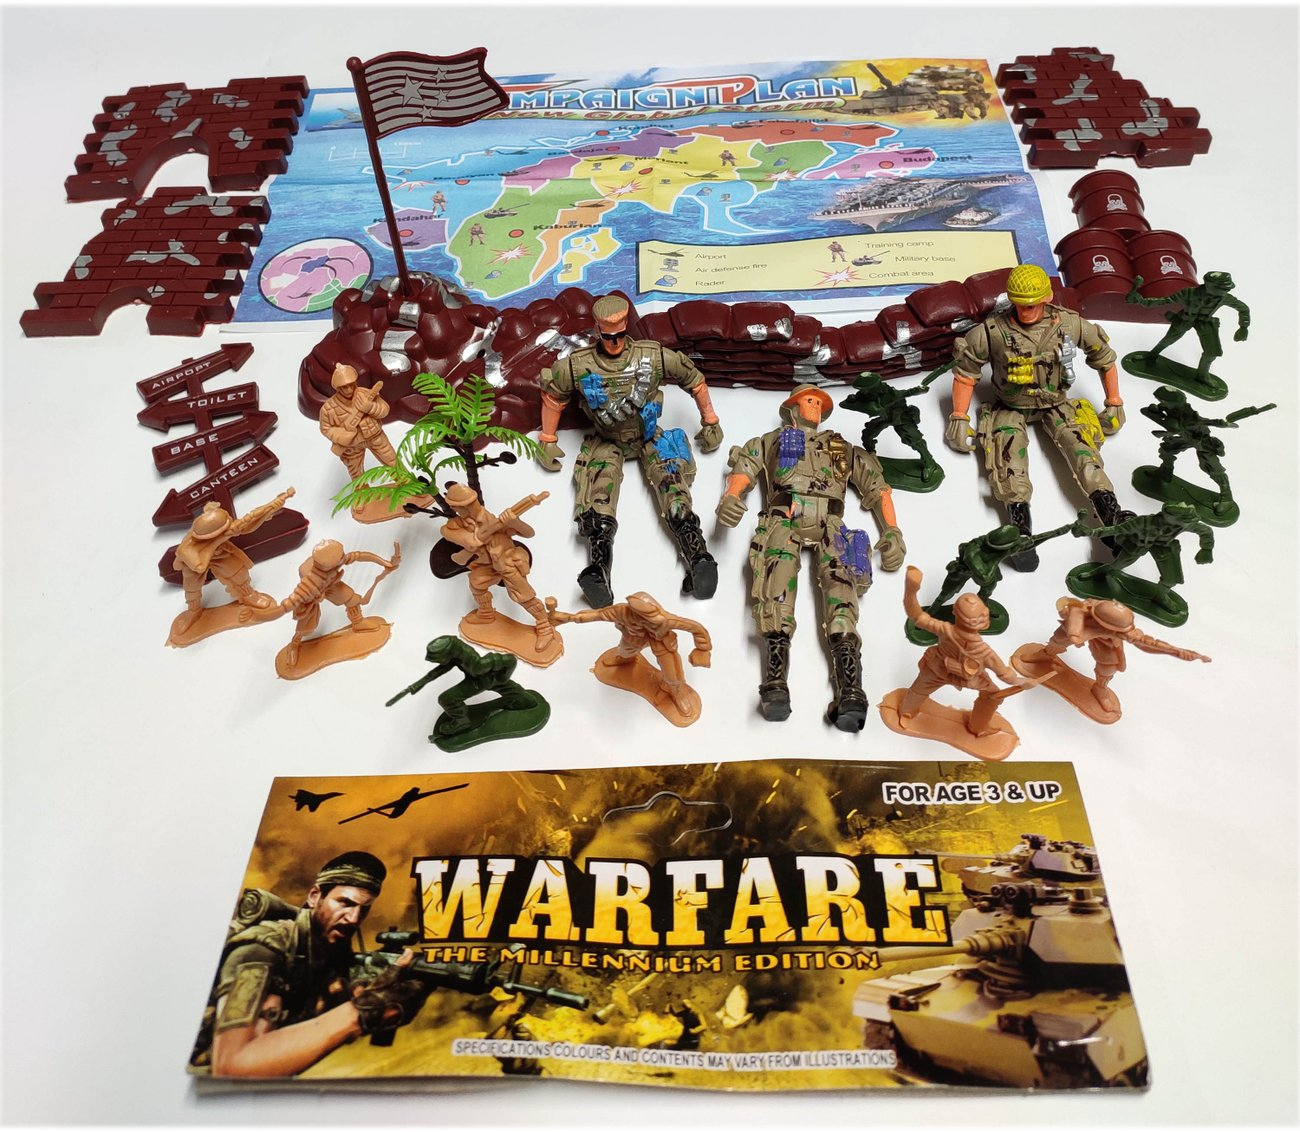 Детска играчка Военен комплект Комбат Combat с офицери, войници и крепост